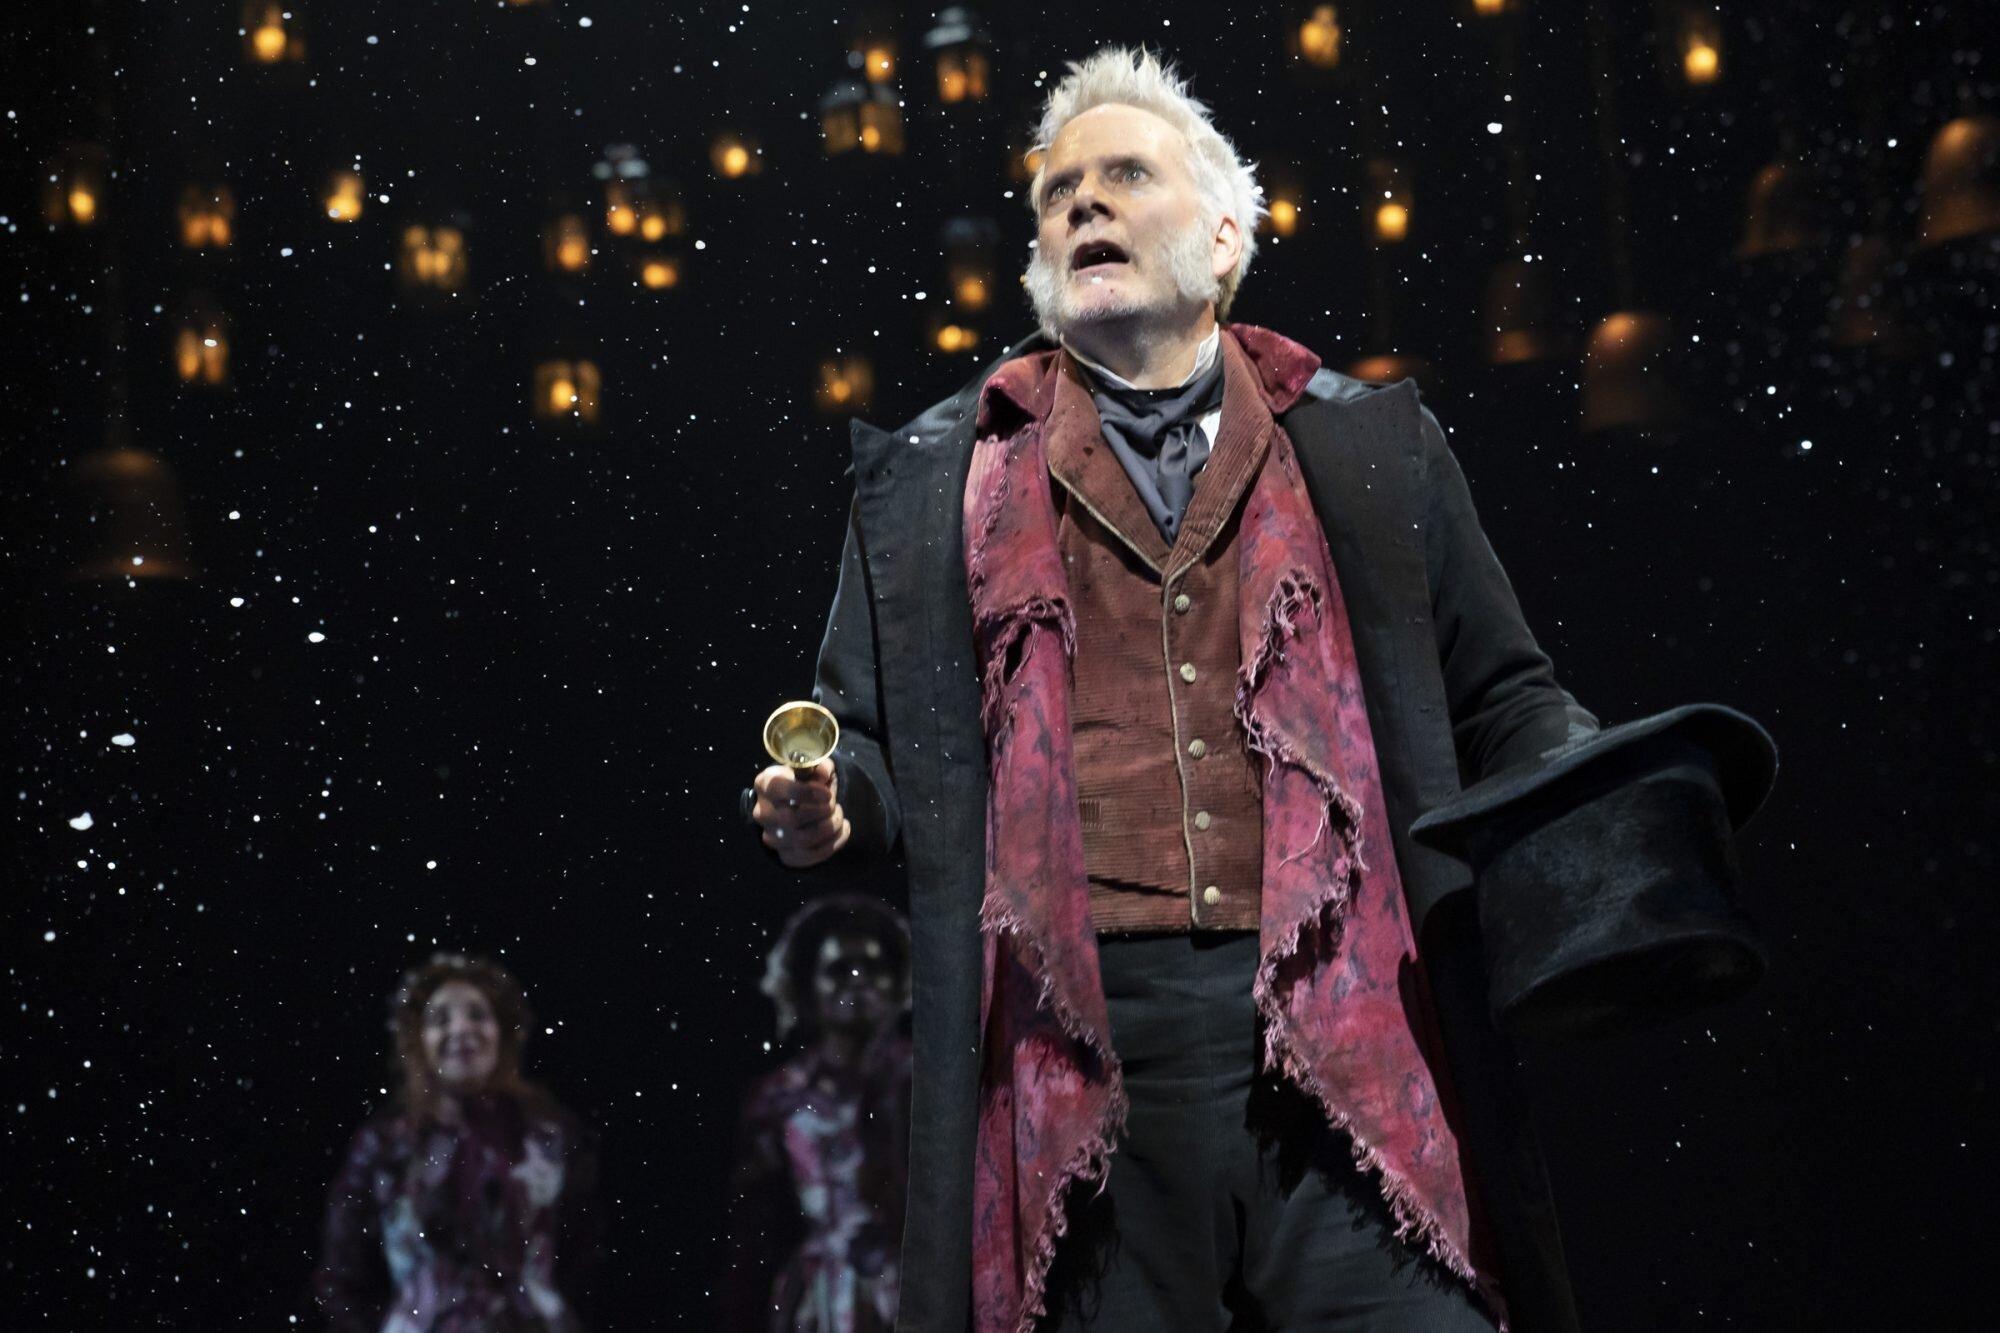 A Christmas Carol Nyc 2020 A Christmas Carol Broadway review: Dreary and delightful | EW.com